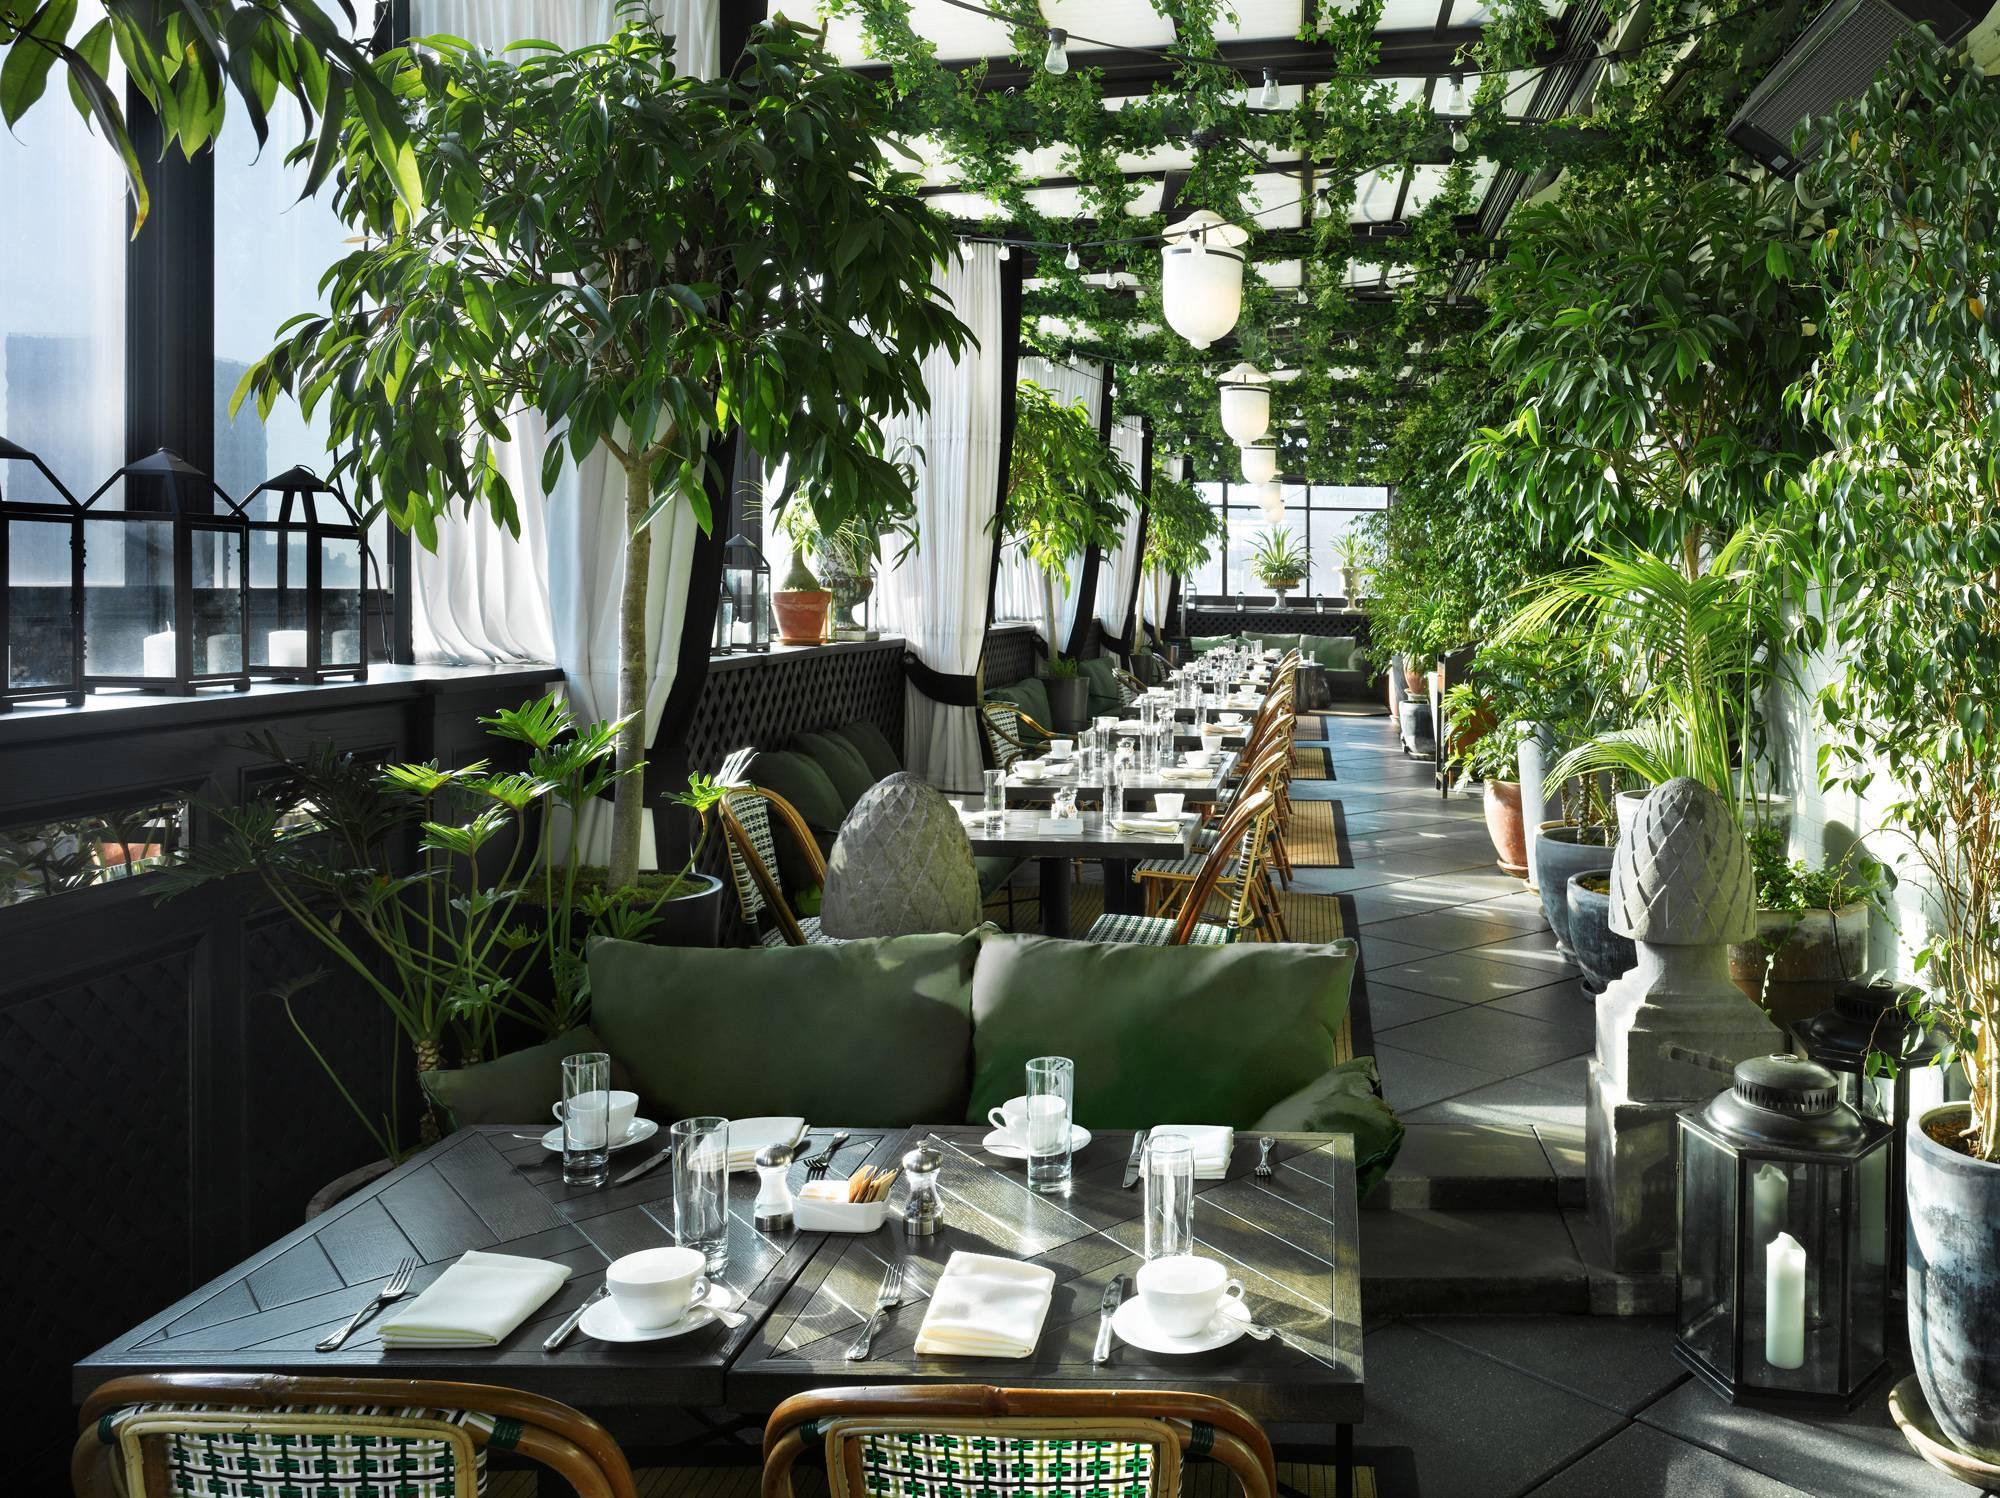 Live la vie de boh me at gramercy park hotel 39 s renovated for The terrace restaurant